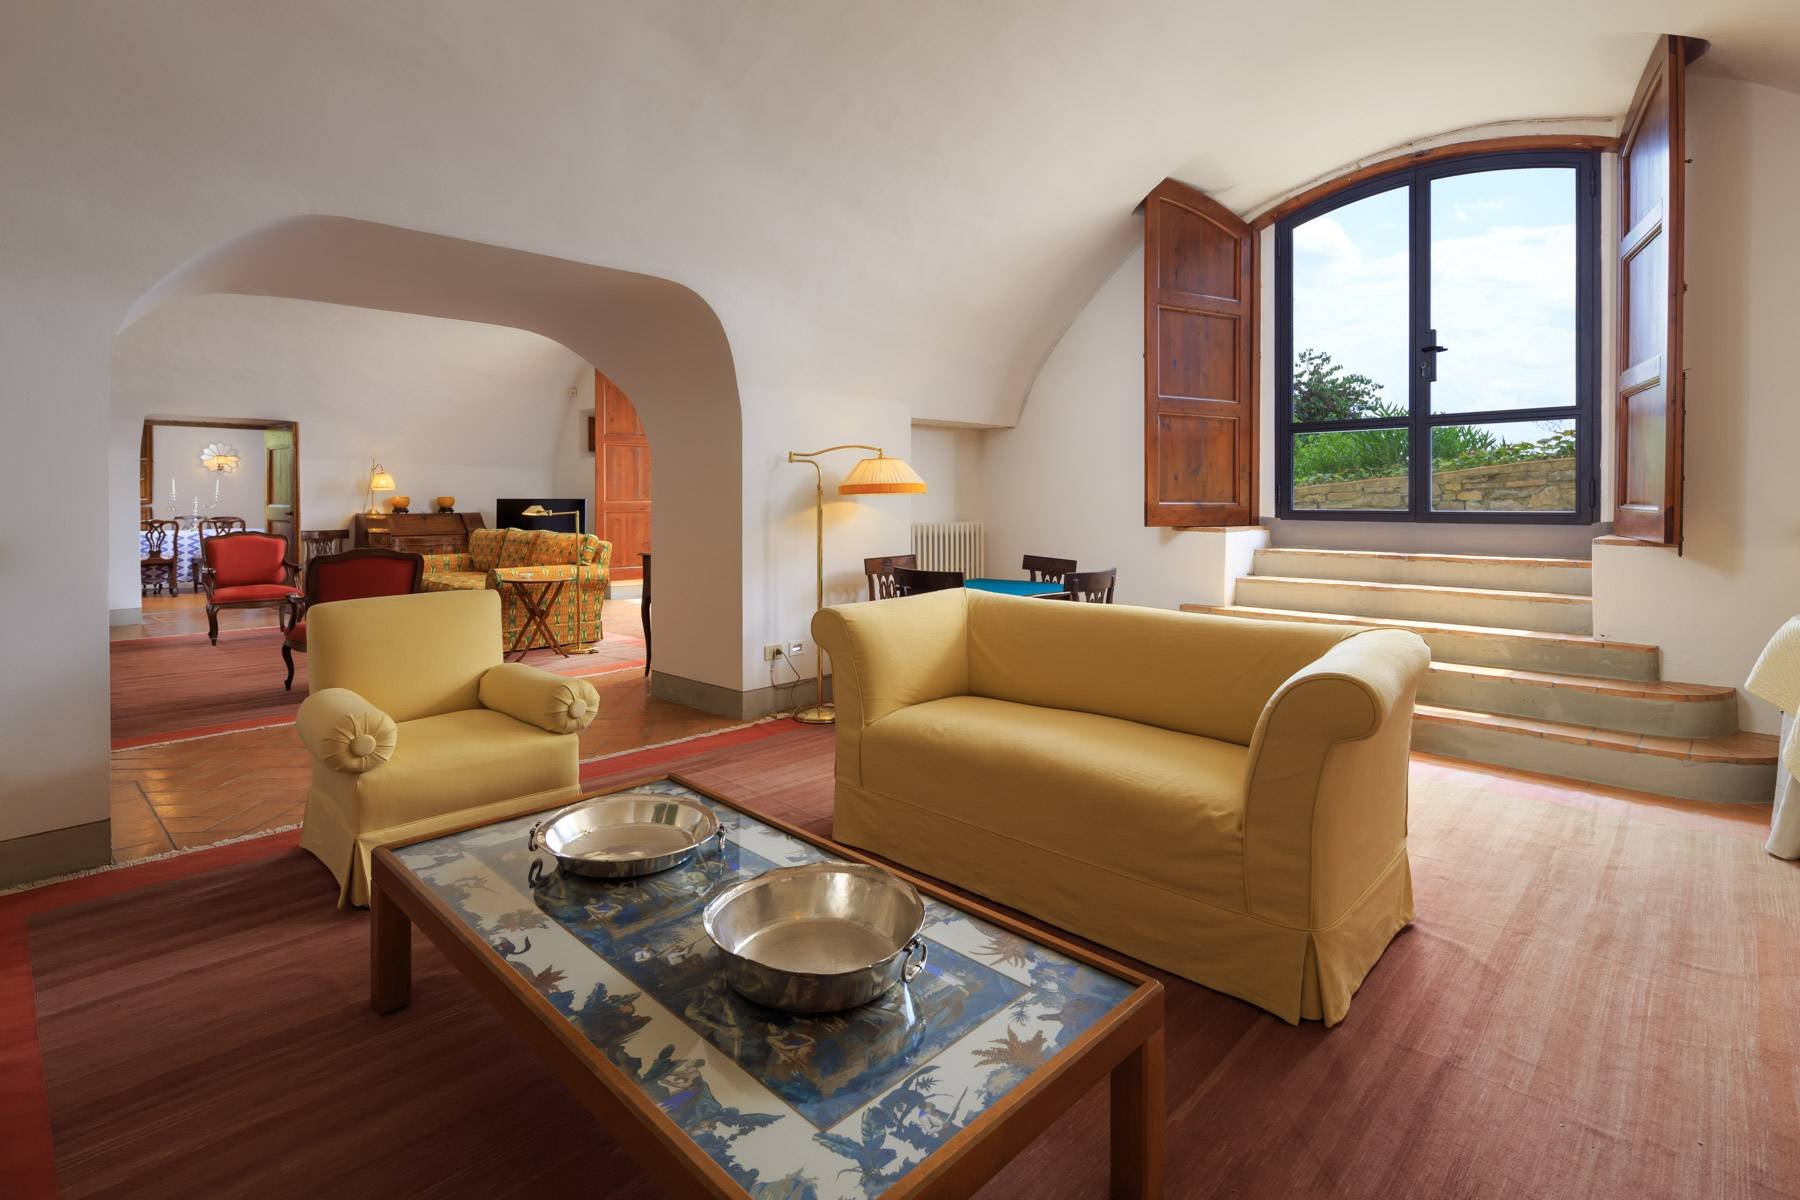 Villa in Affitto a Firenze: 5 locali, 600 mq - Foto 7